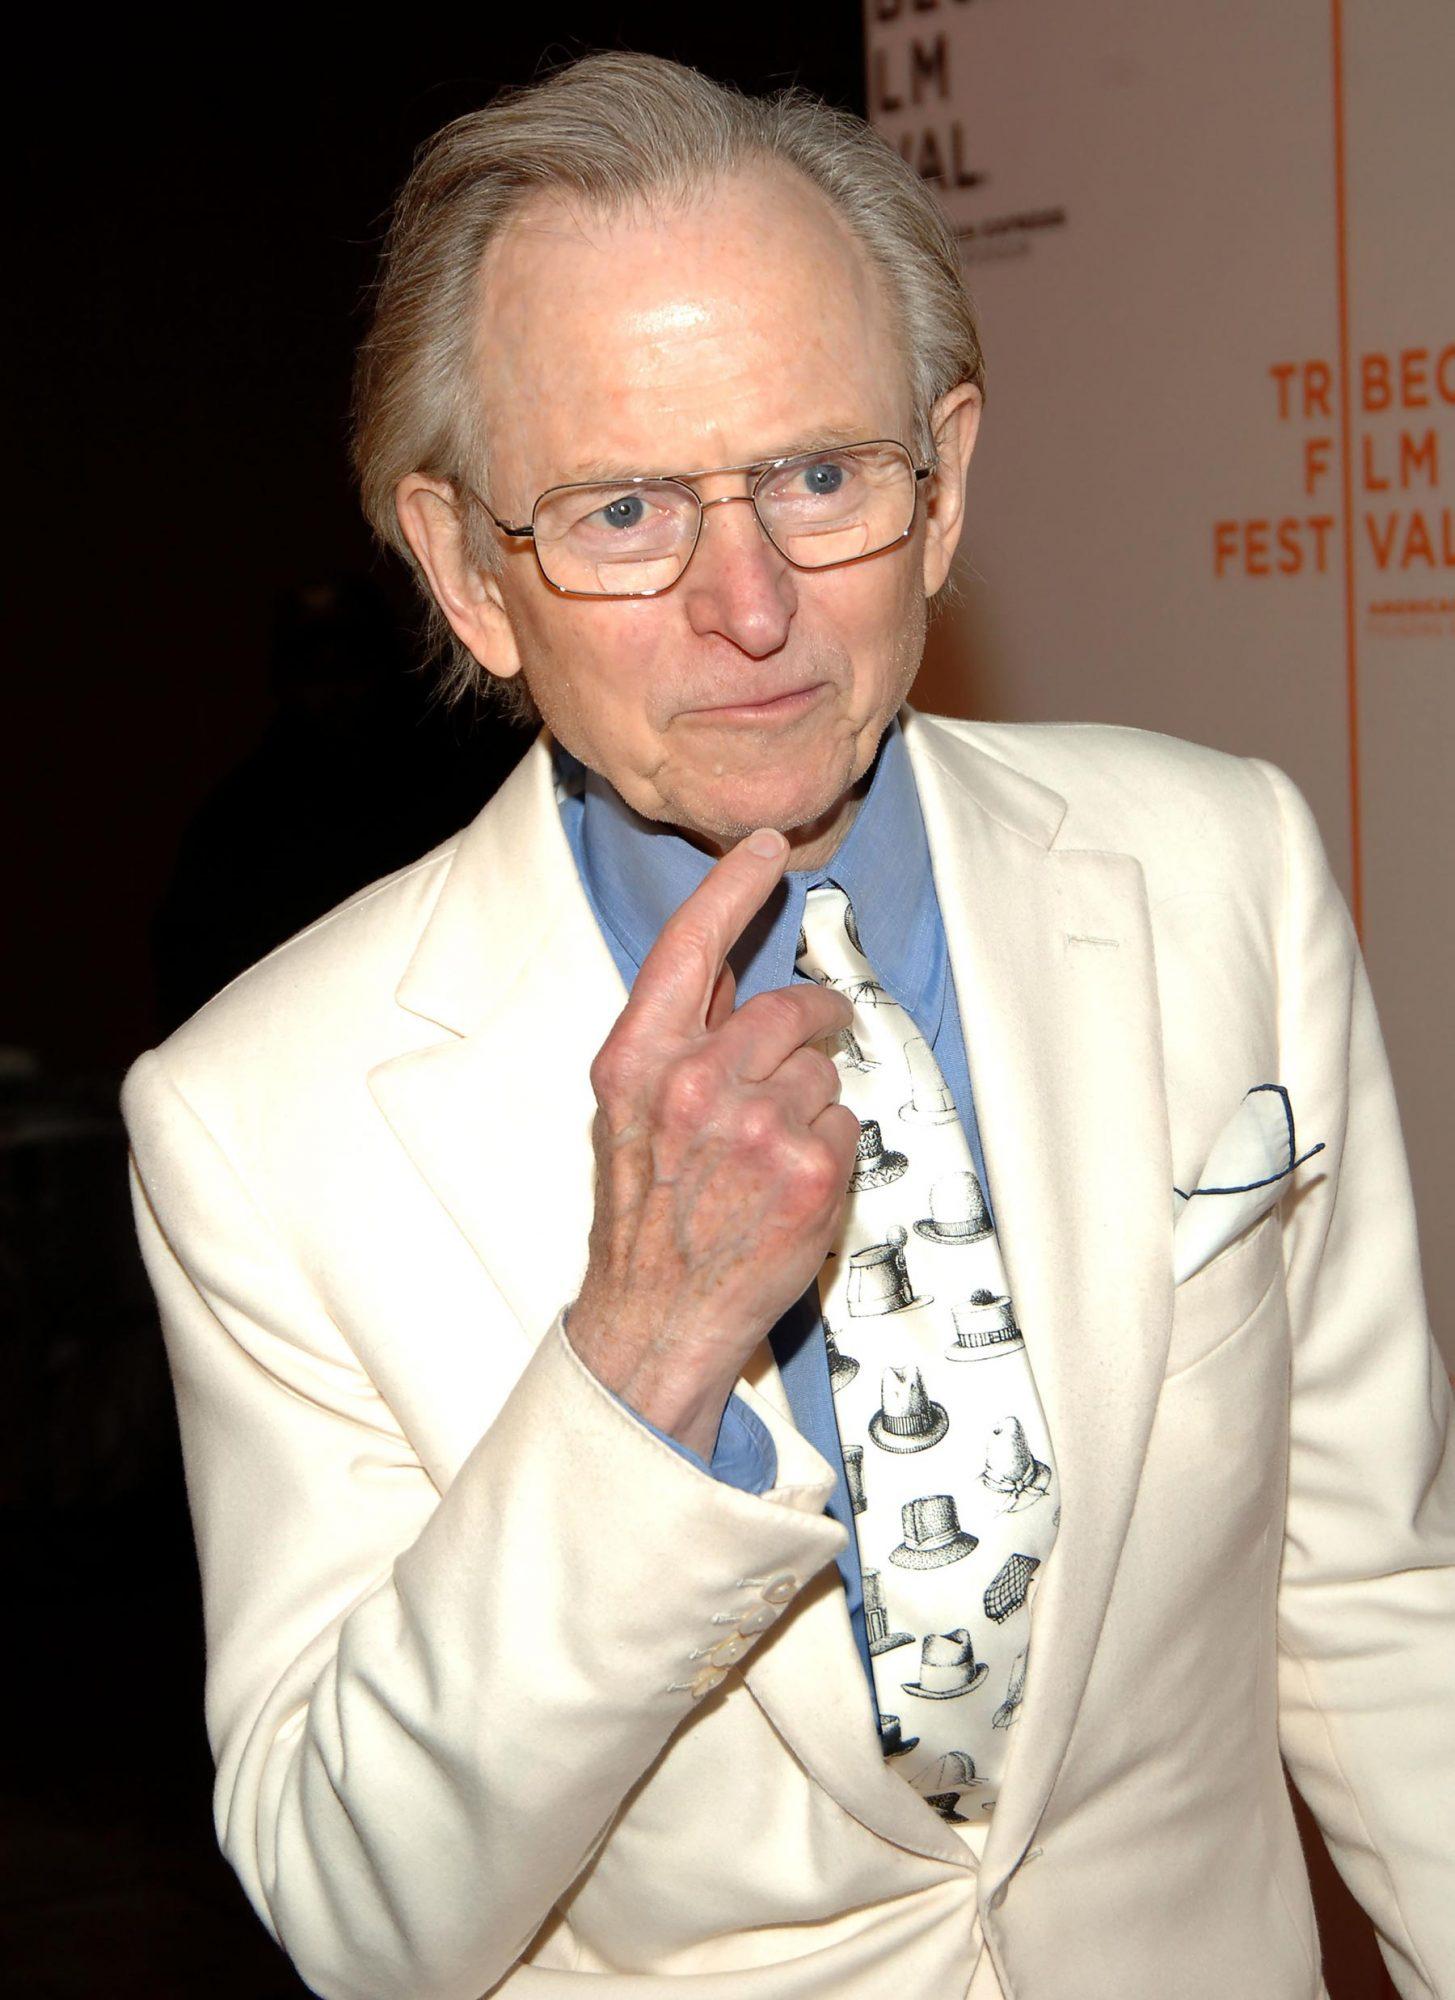 4th Annual Tribeca Film Festival Awards Ceremony